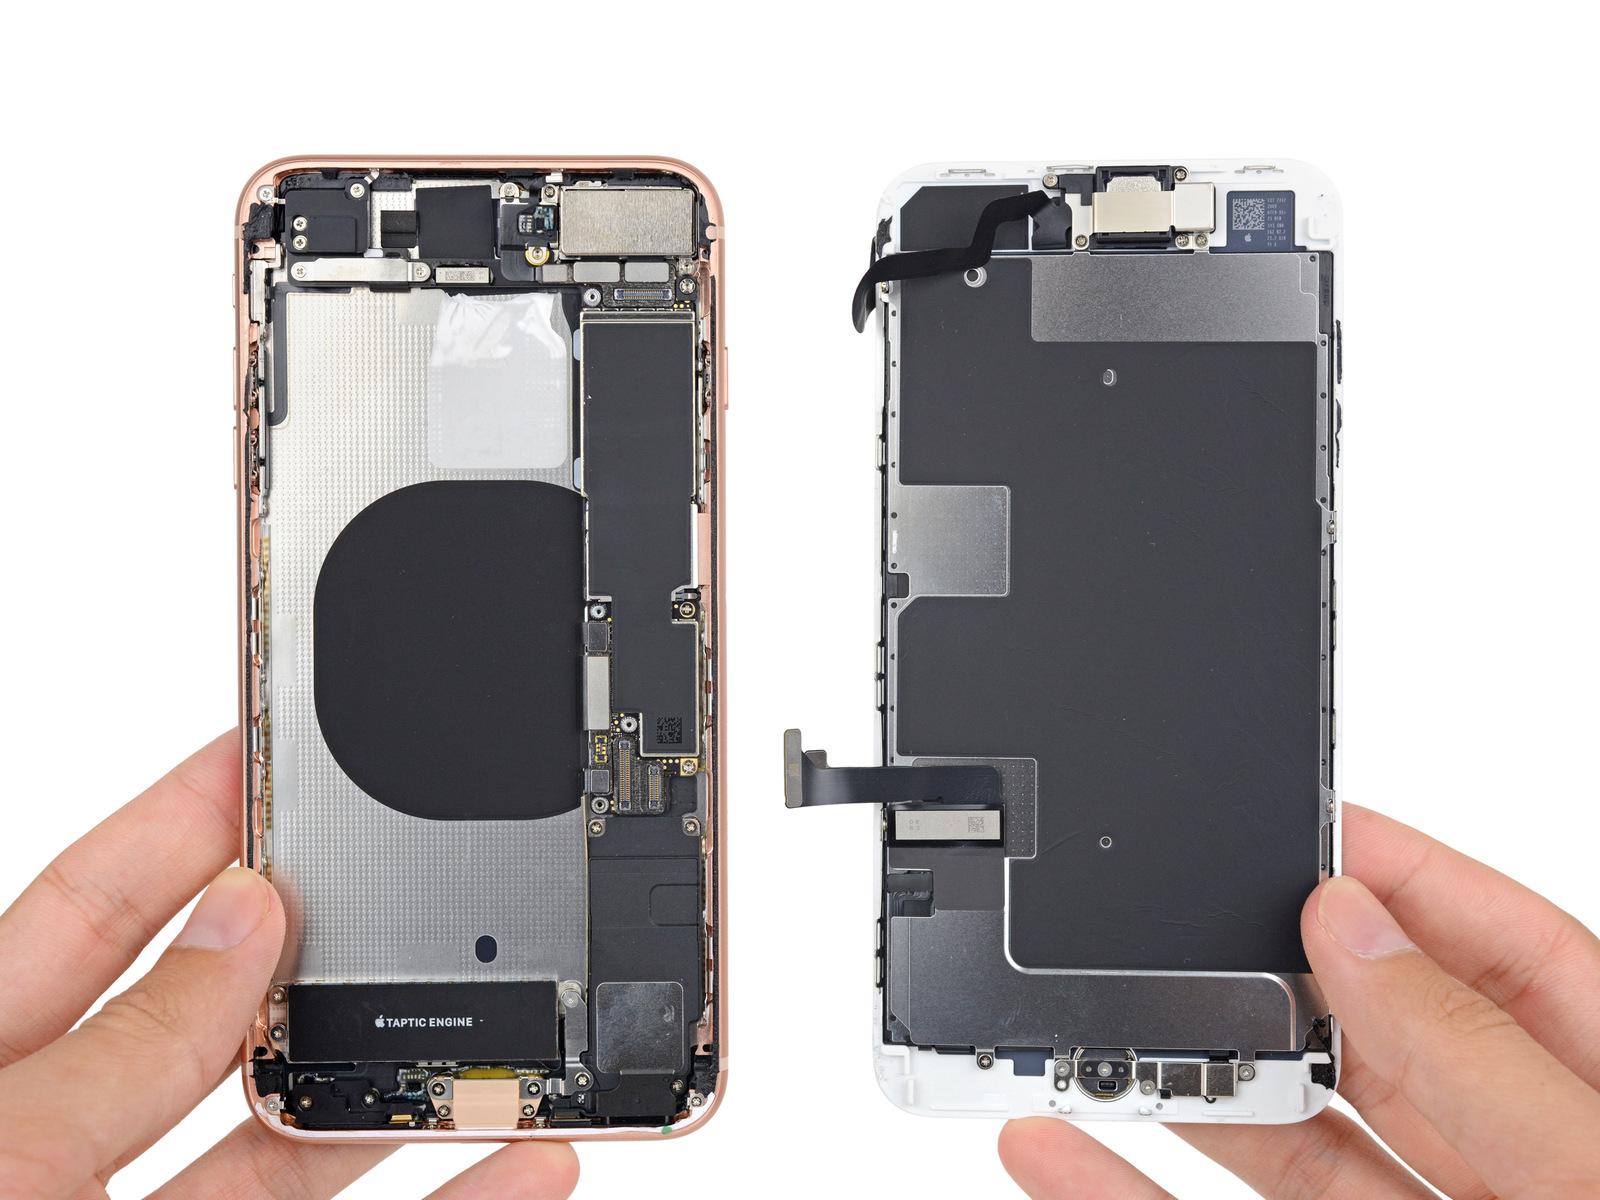 small iphone.jpg